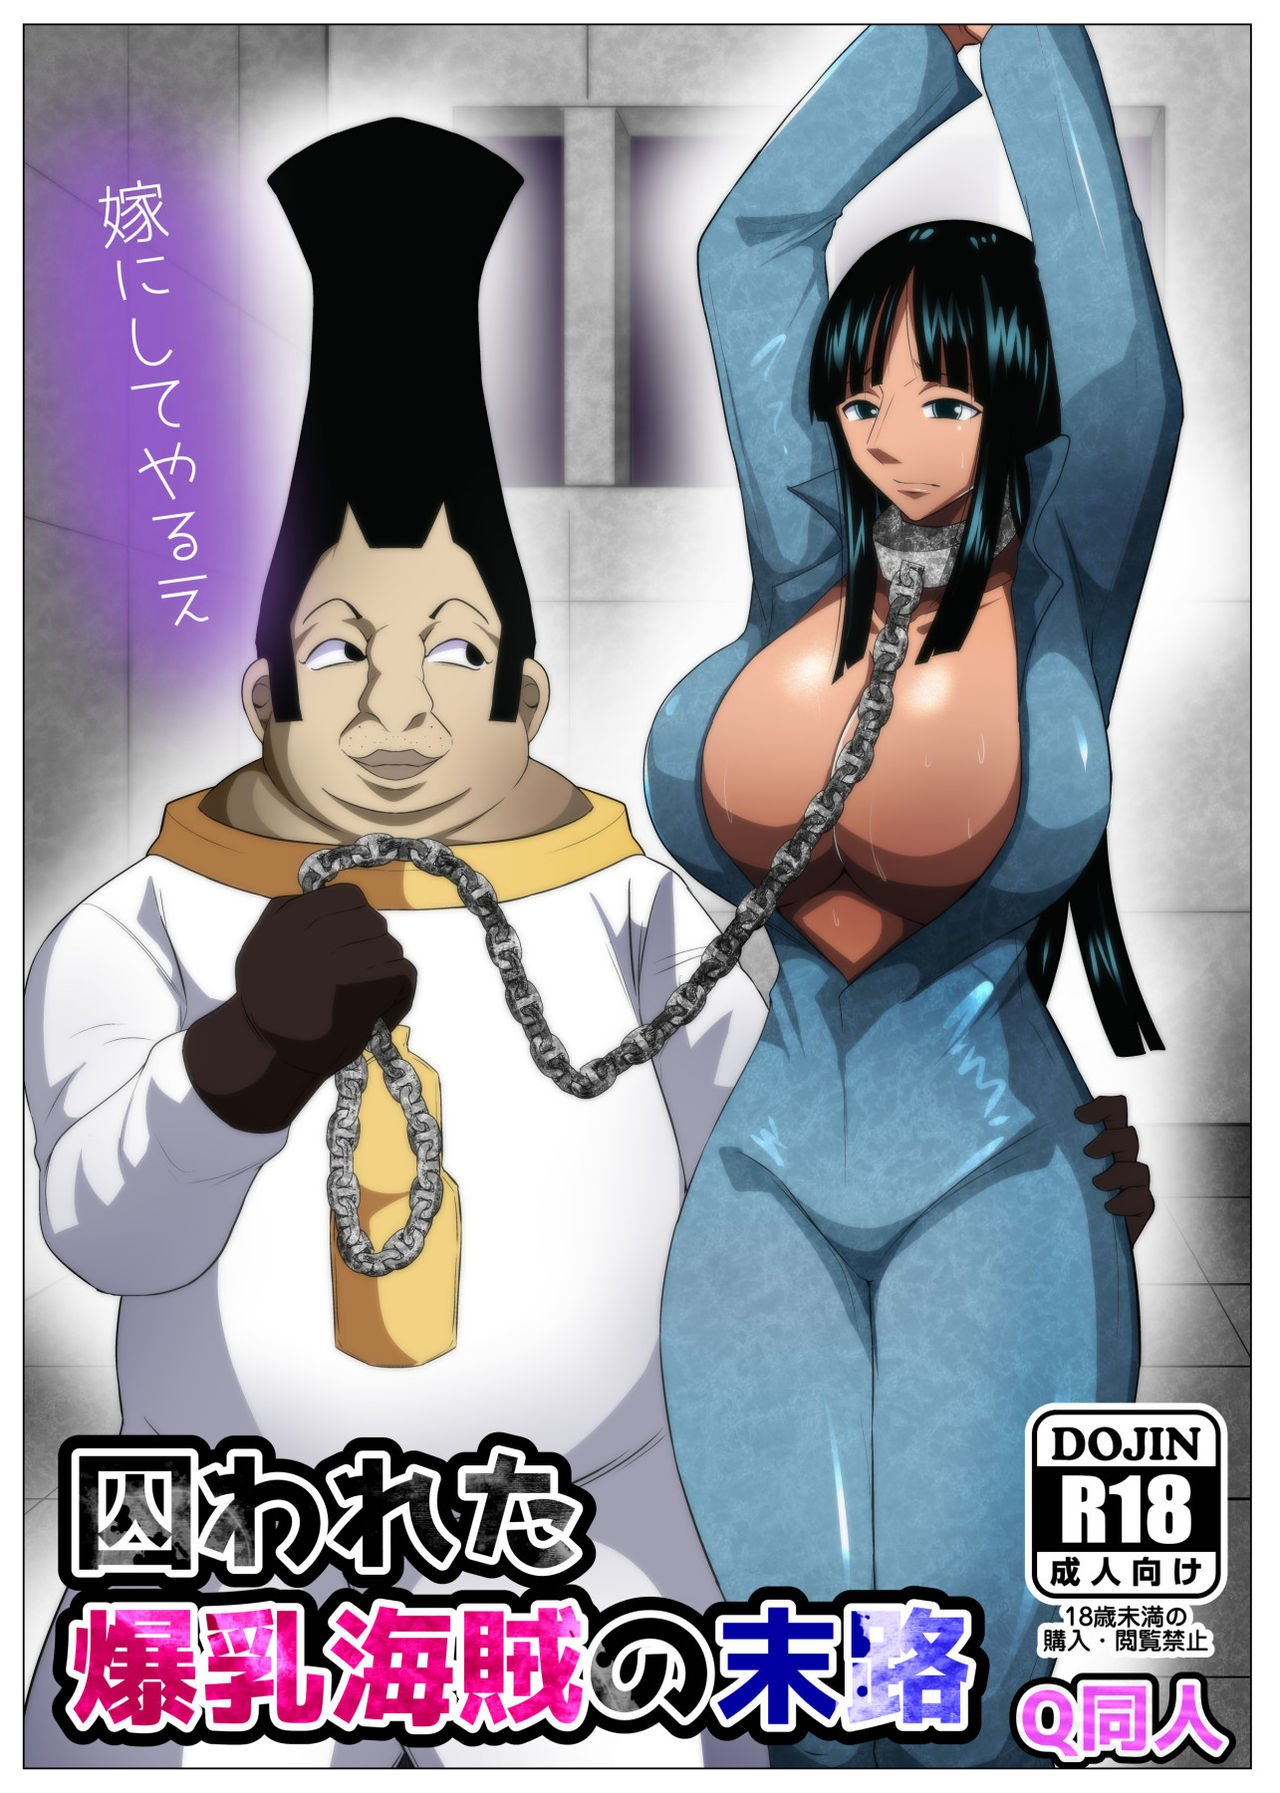 One piece comics porno color Read Nico Robin Porn Comics Hentai Porns Manga And Porncomics Xxx 1 Hentai Comics